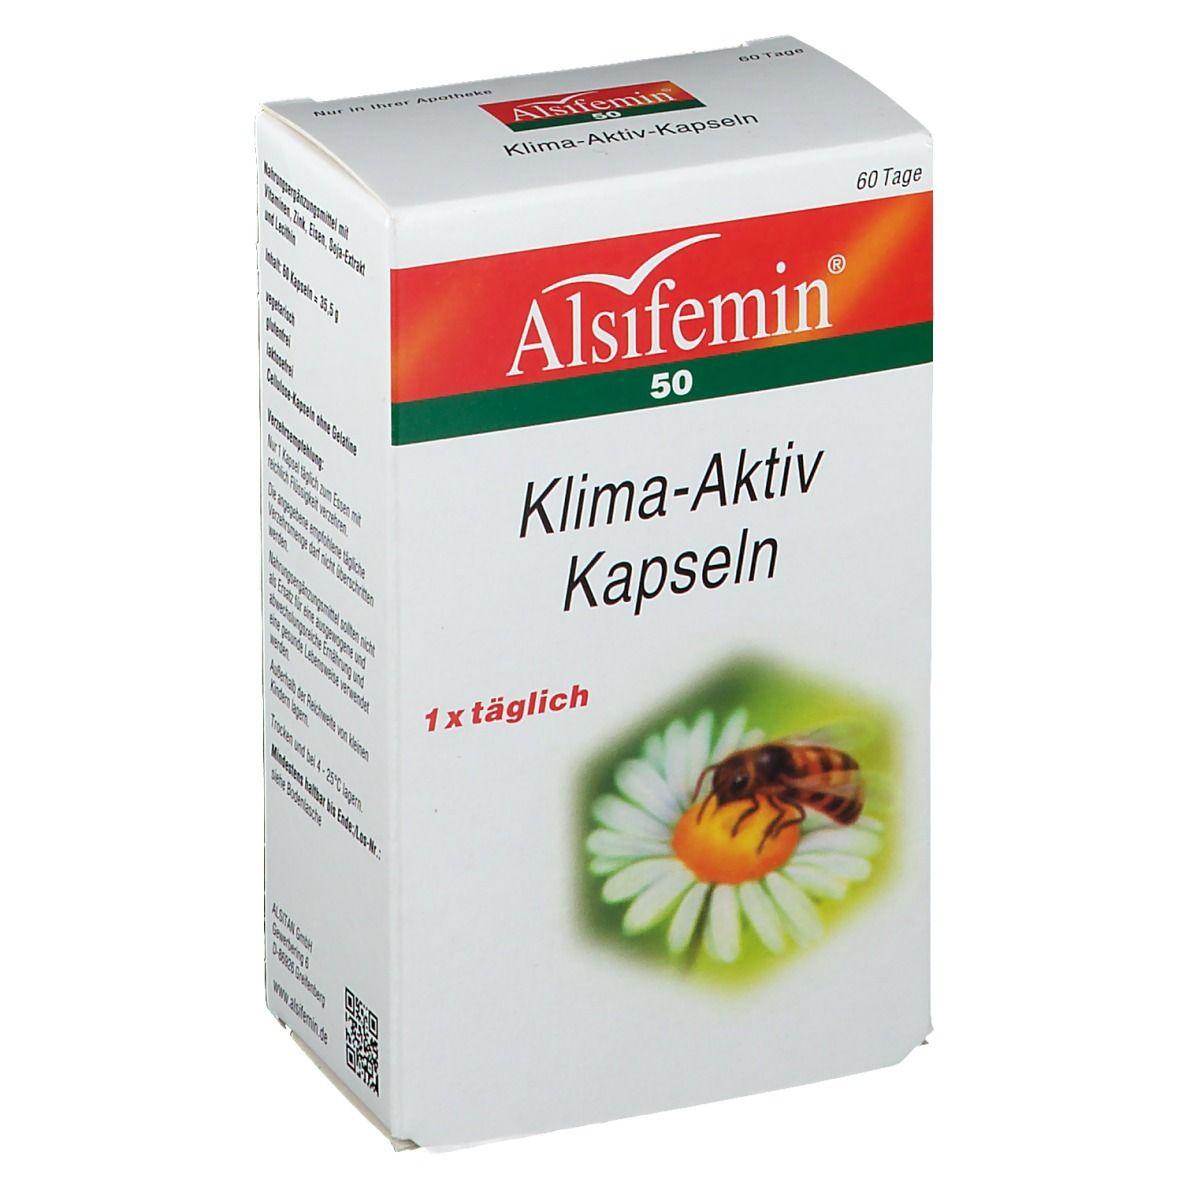 Image of Alsifemin® 50 Klima-Aktiv-Kapseln